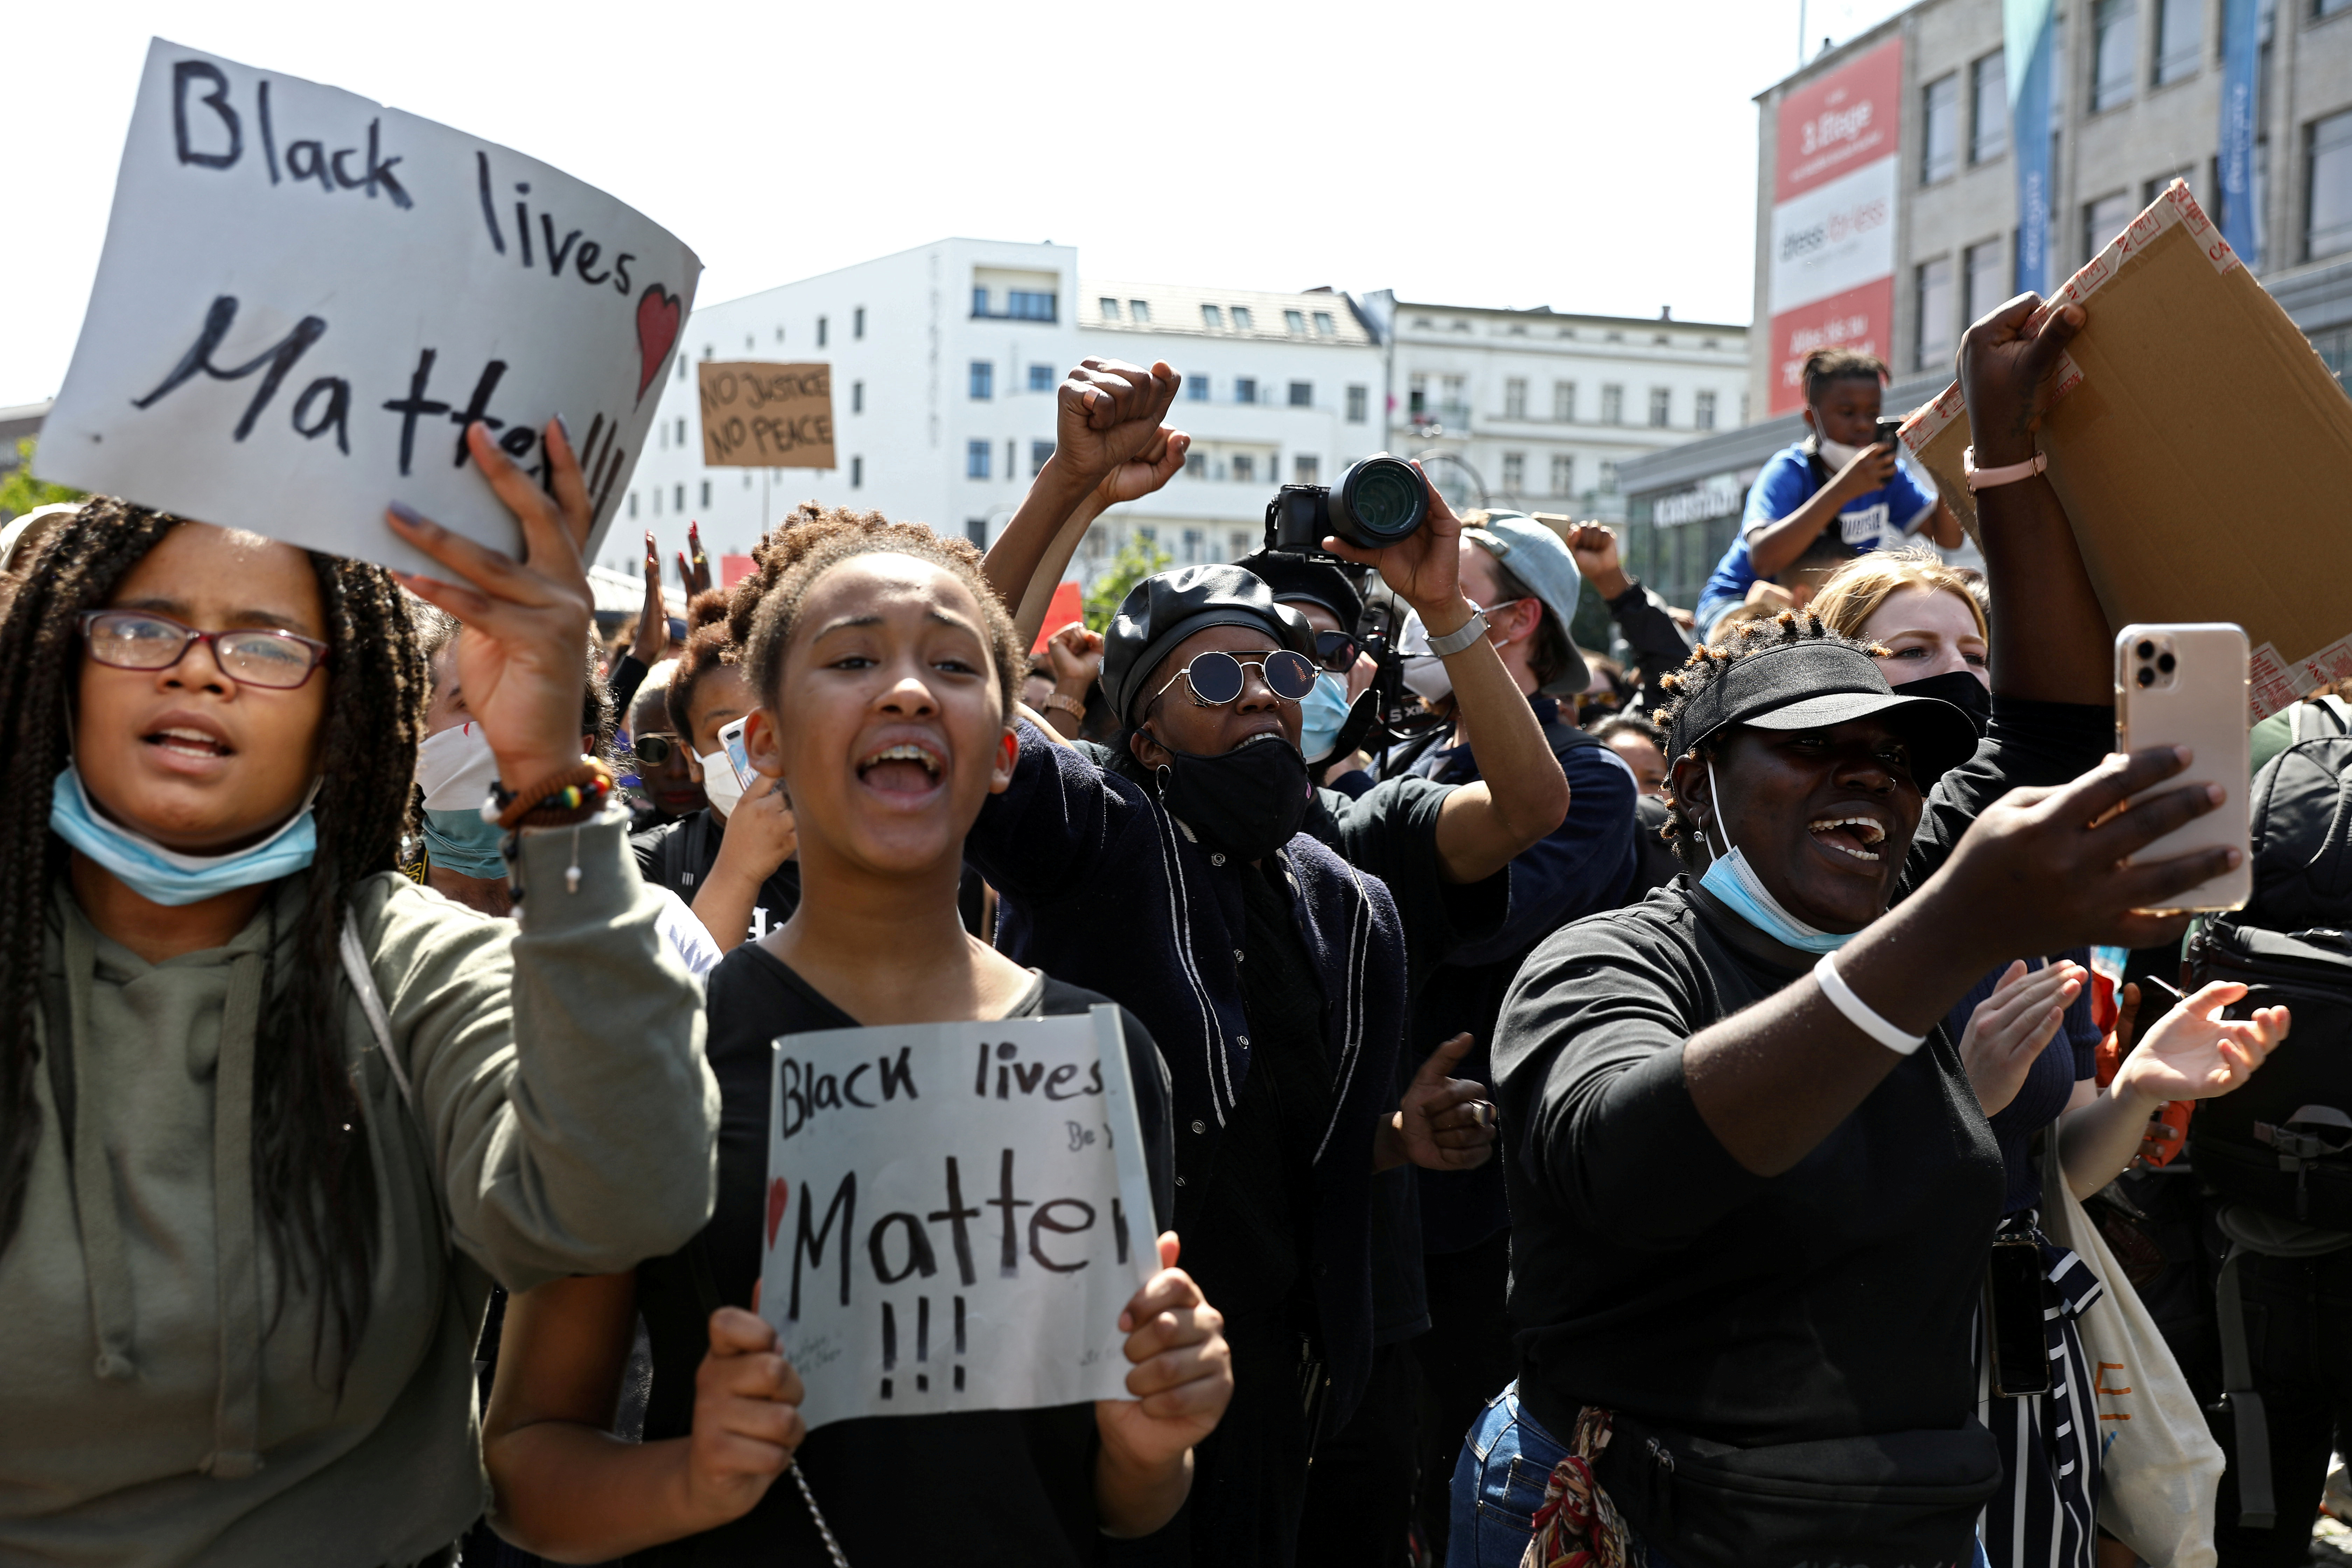 مظاهرات في برلين تنديداً بمقتل جوروج فلويد